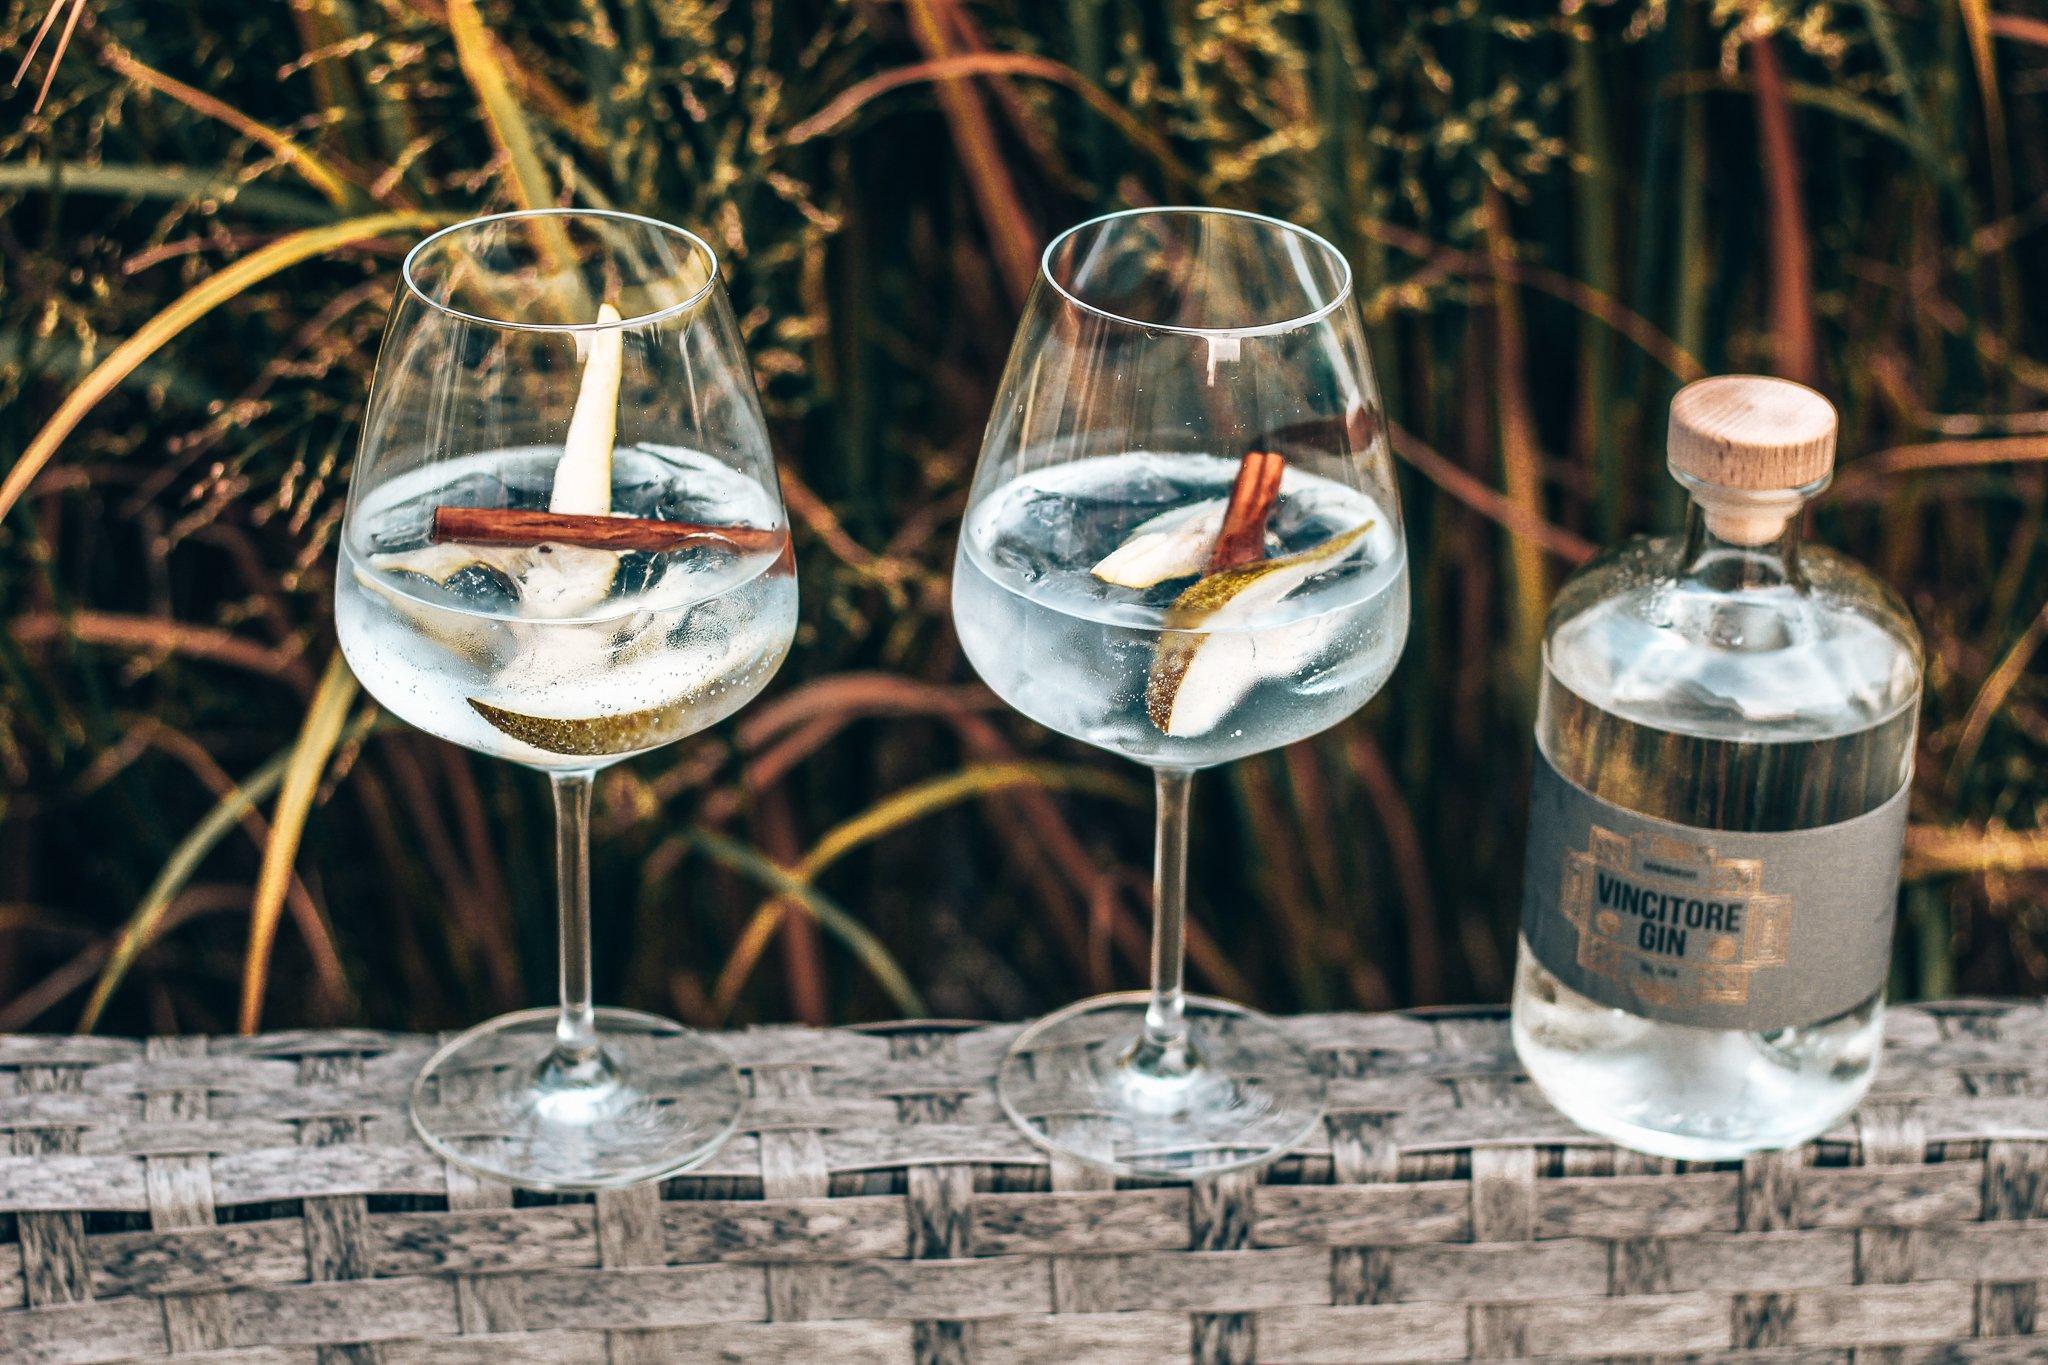 Vincitore gin, perfect serve Vincitore Gin, Monika van Miltenburg, Alles over gin.